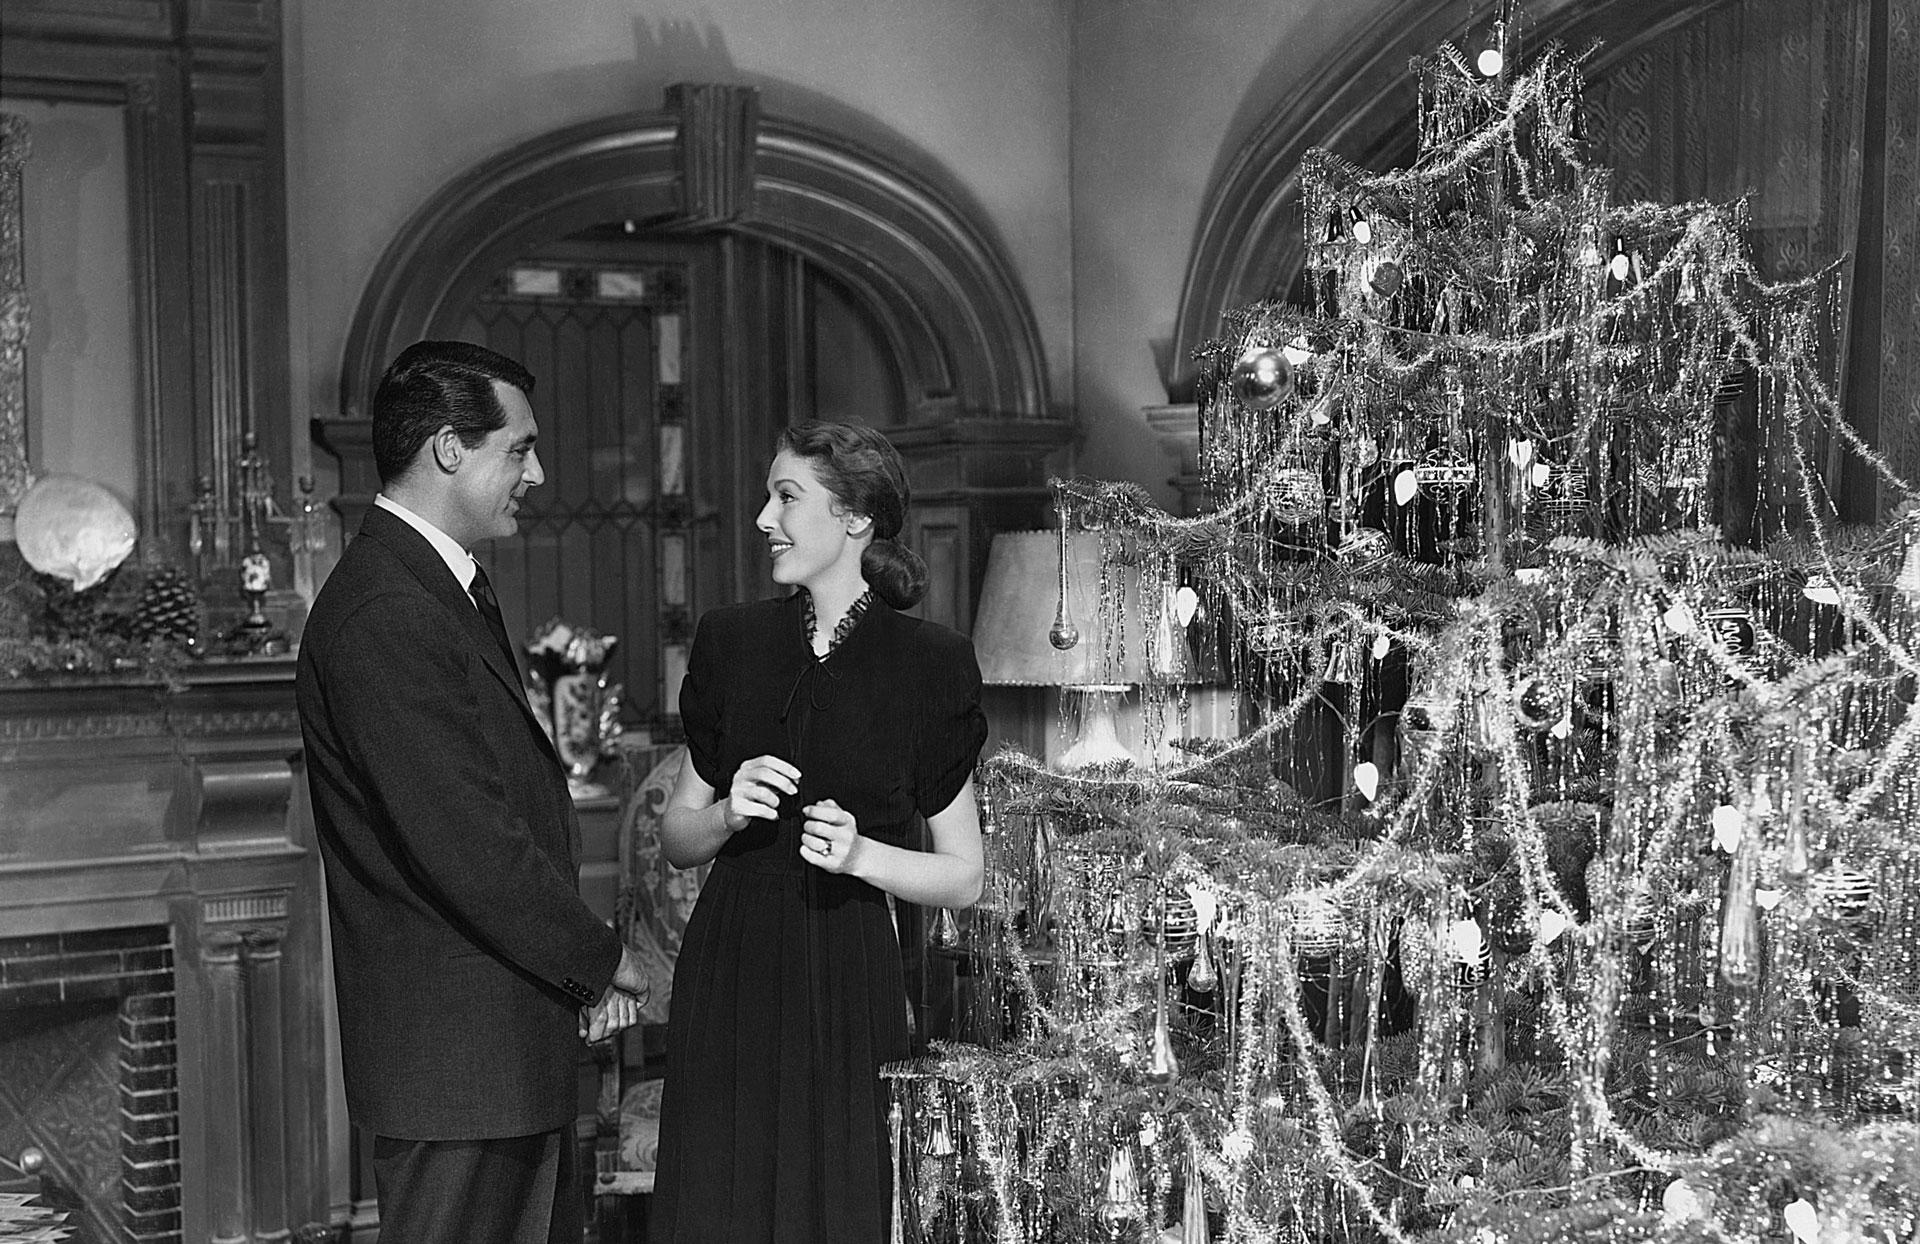 Imagini pentru The Bishop's Wife (1947)